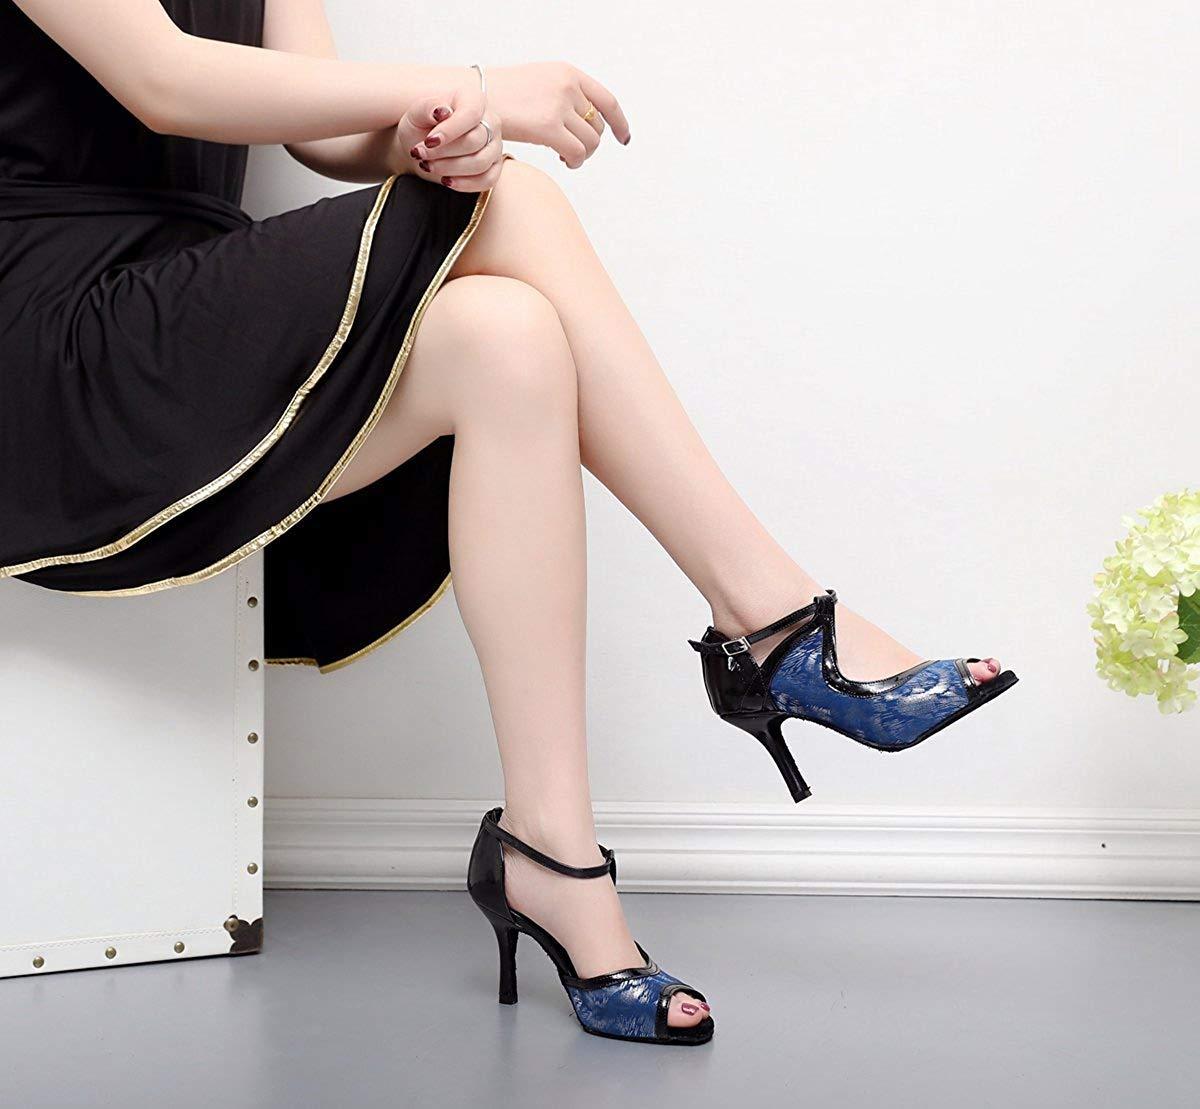 Qiusa Qiusa Qiusa TJ7130 Damen Mädchen Snake-Print Knöchelriemen Blau Synthetische Tanzschuhe UK 7 (Farbe   - Größe   -) 354faf